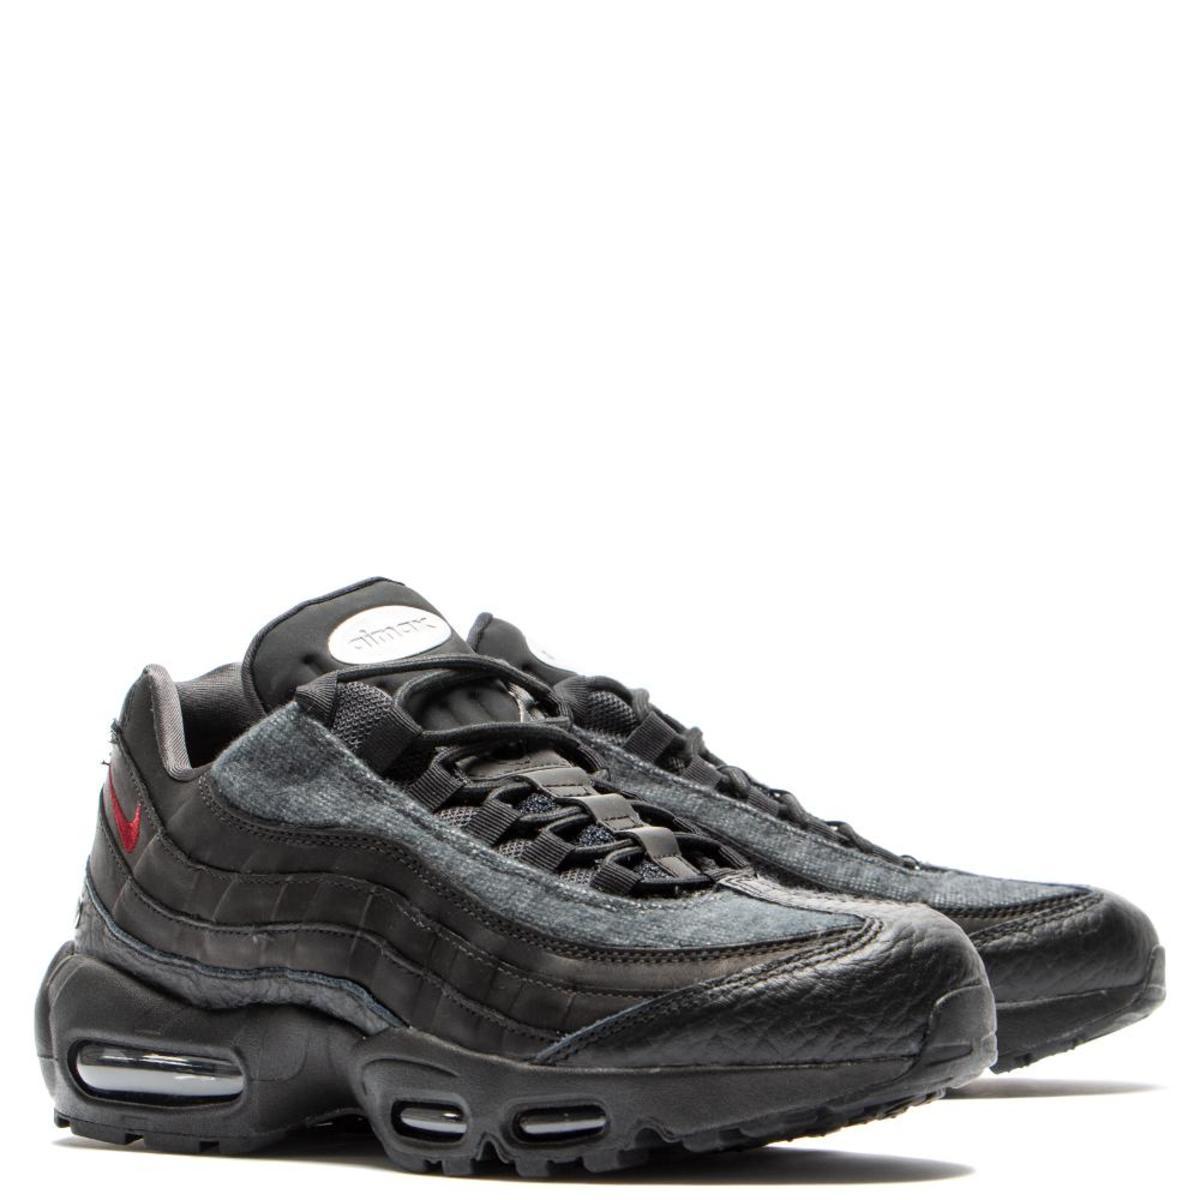 c27725d6764605 Nike Air Max 95 NRG Jacket Pack   Black